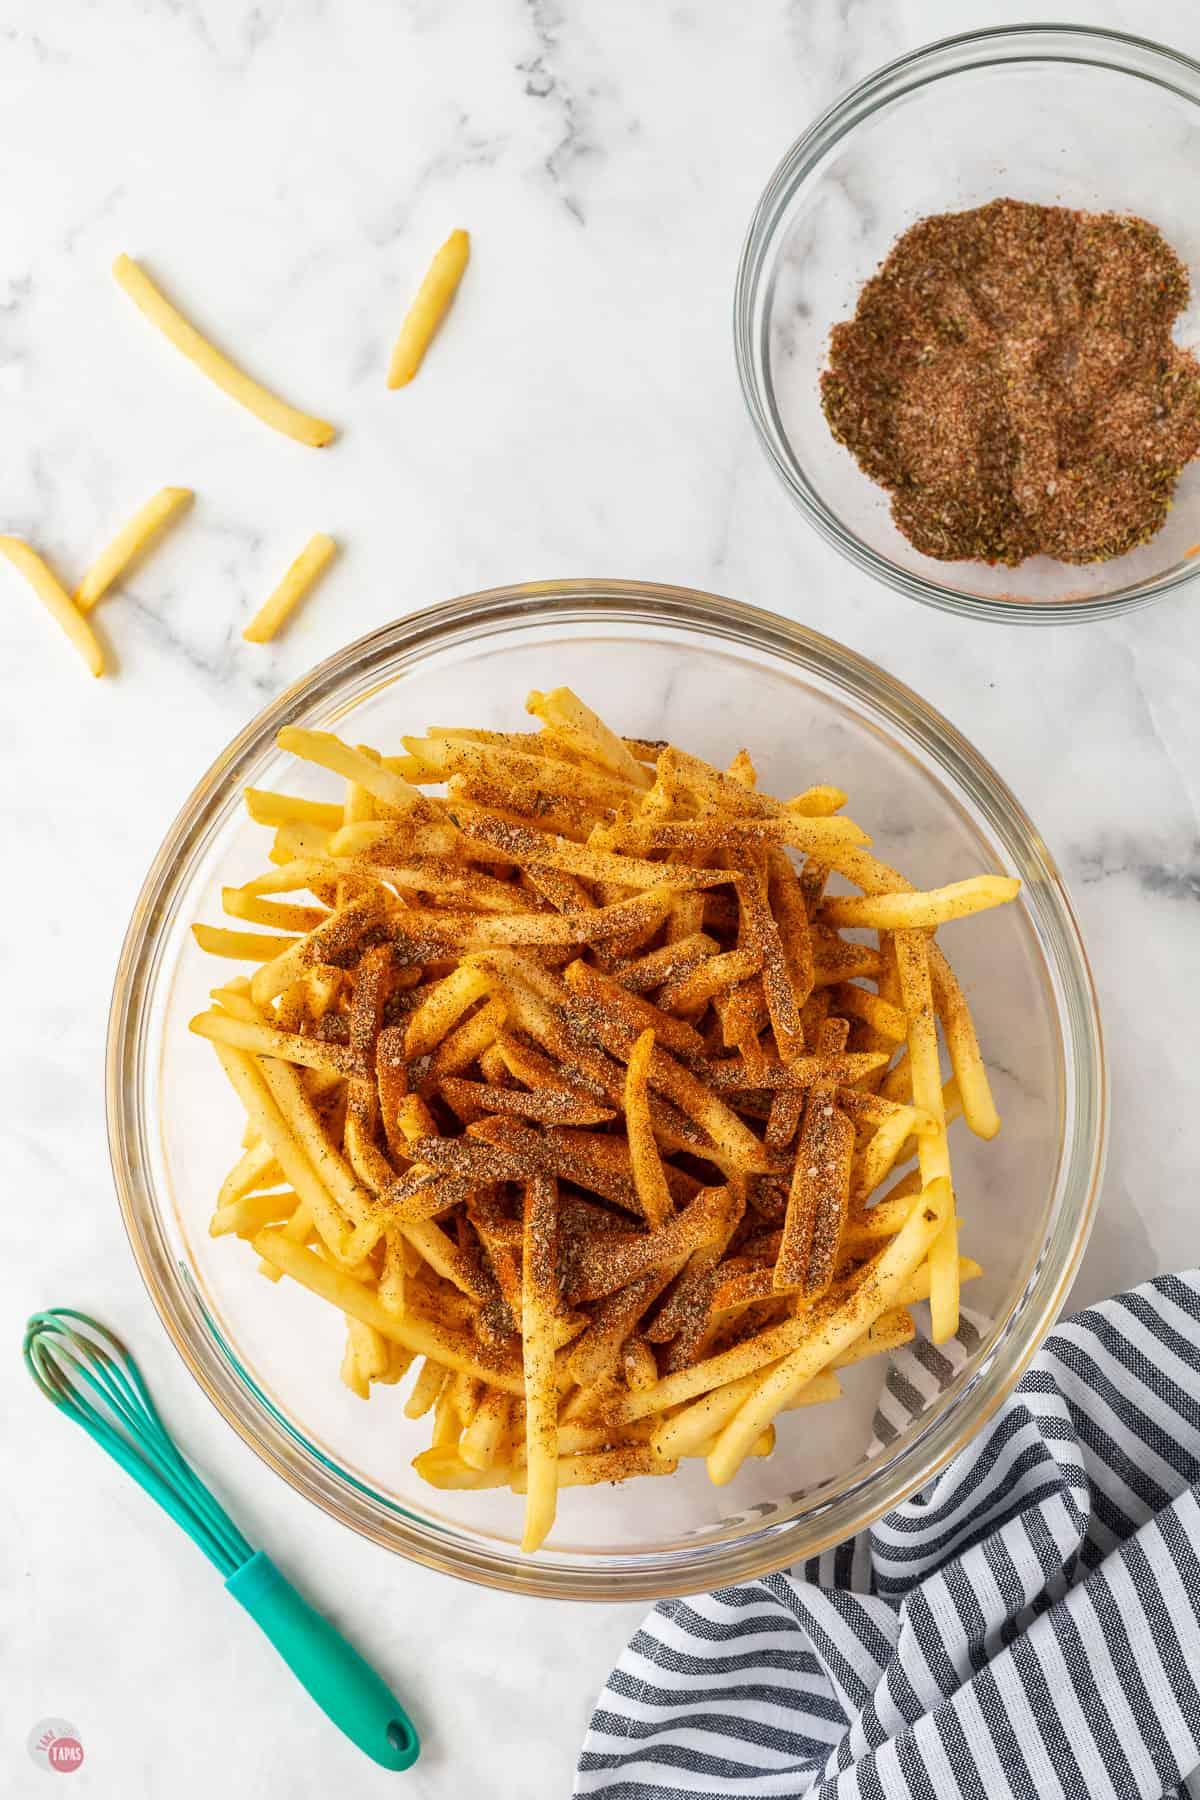 seasoned fries in a bowl